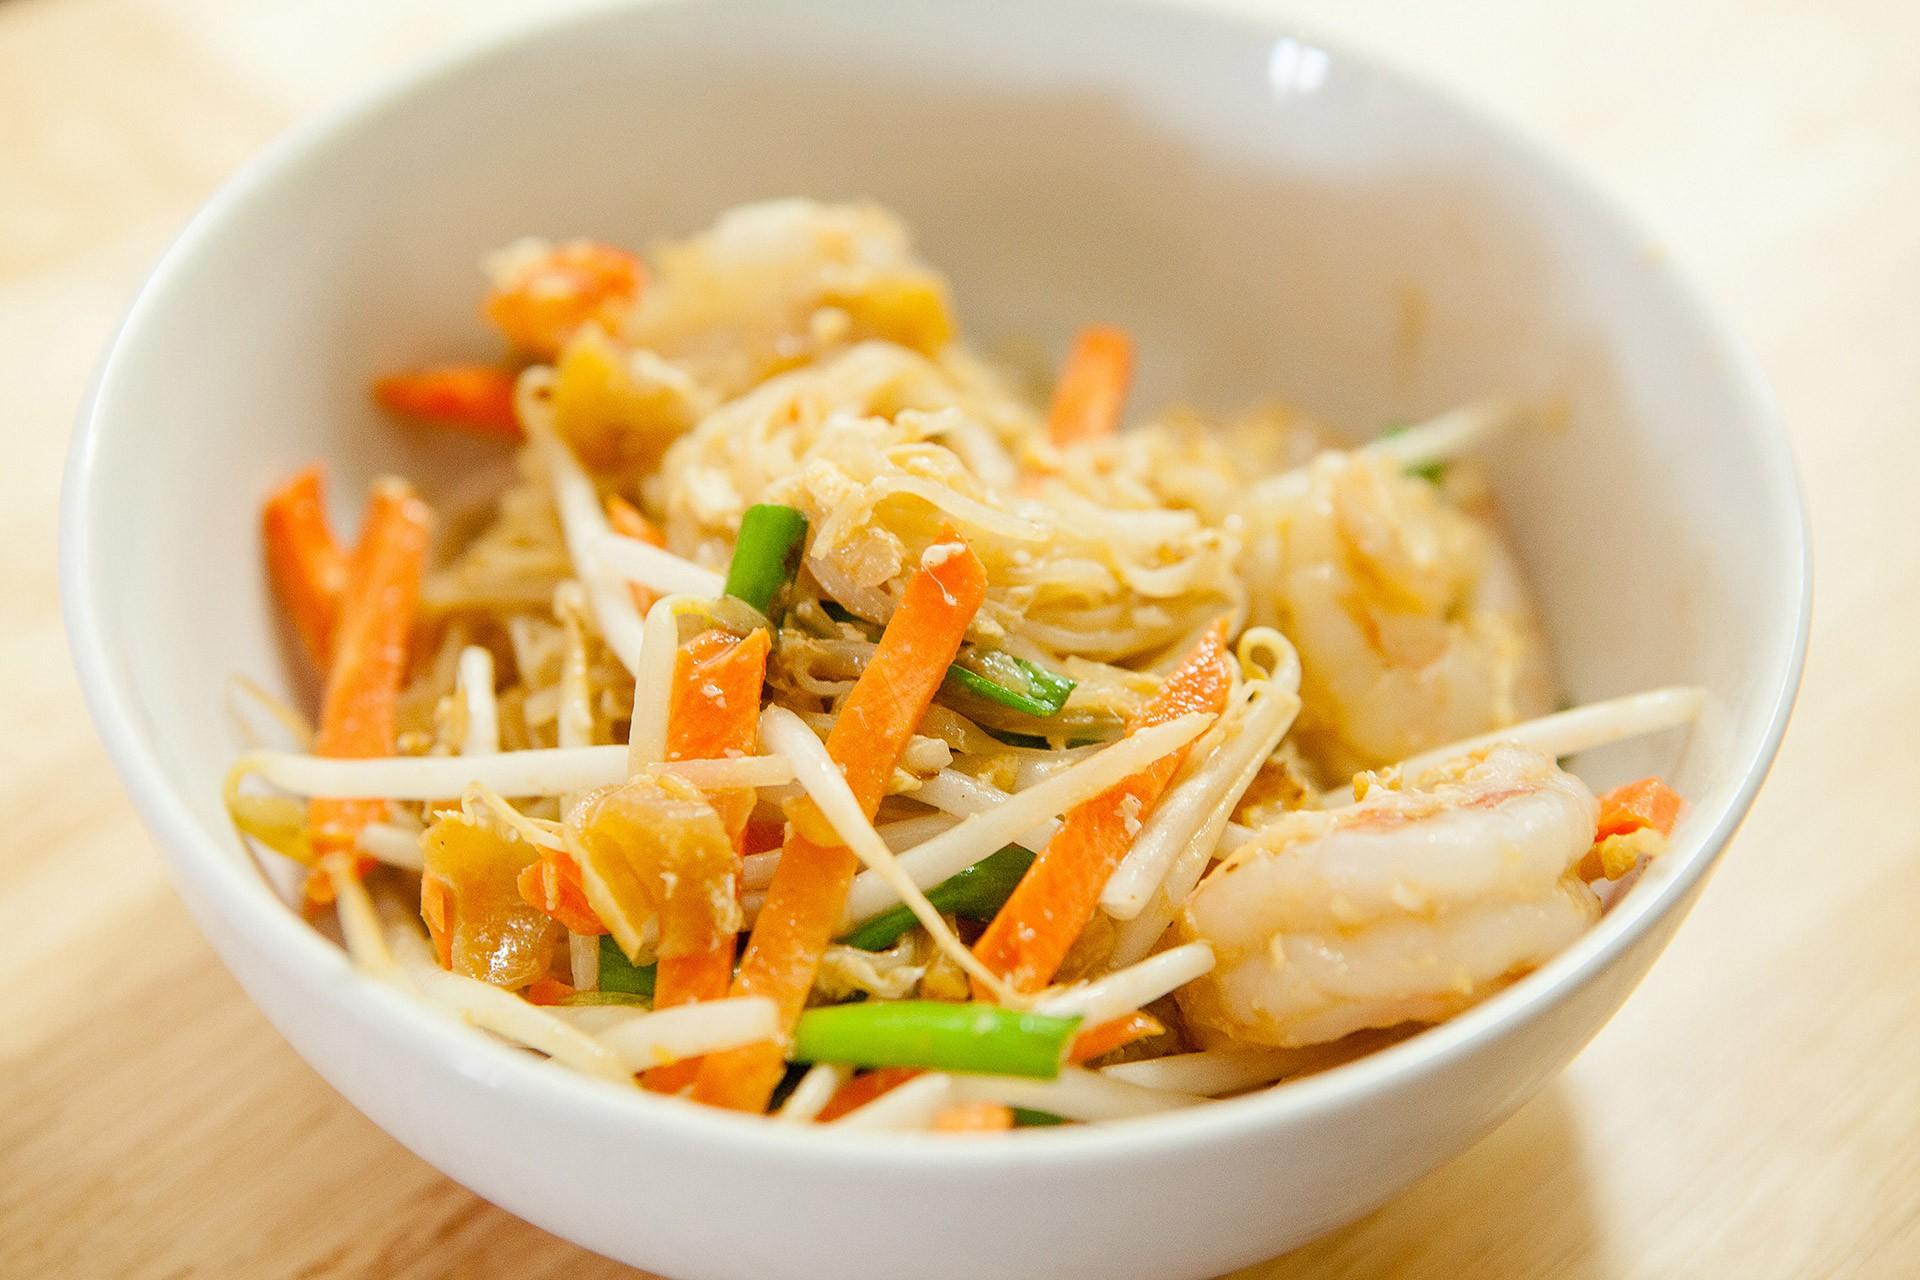 Het lekkerste Thaise afhaalrestaurant vlakbij Edegem